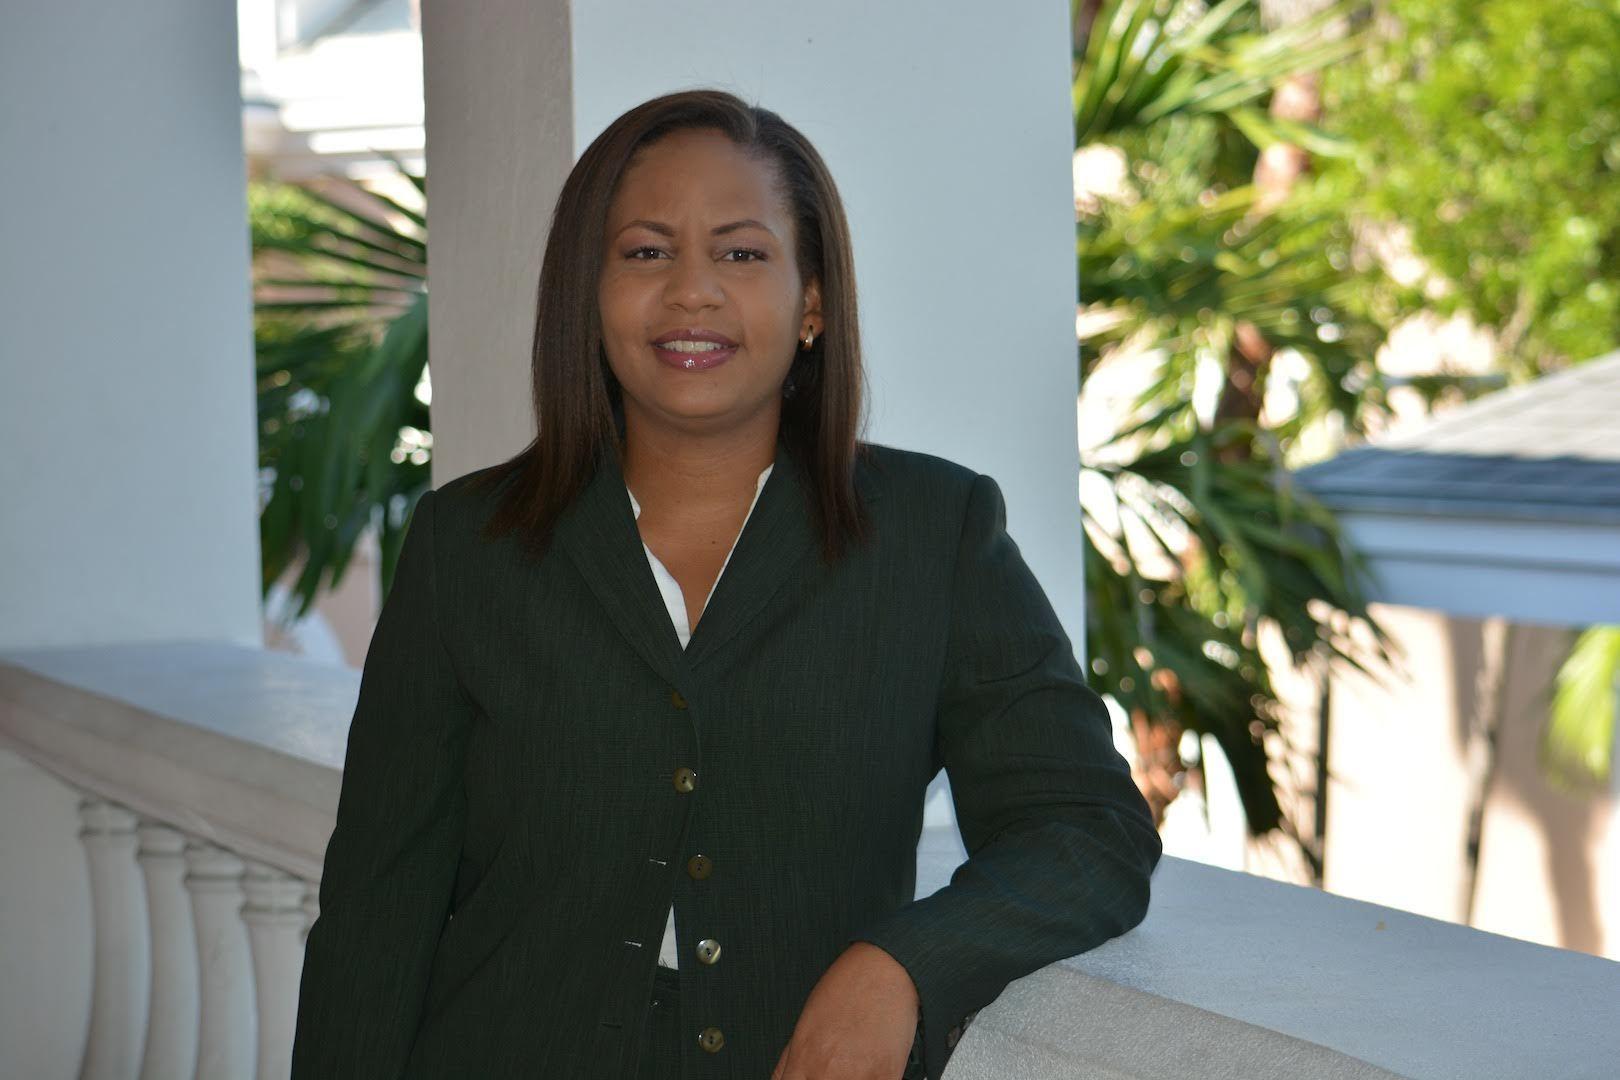 $32 million requested via small business continuity program